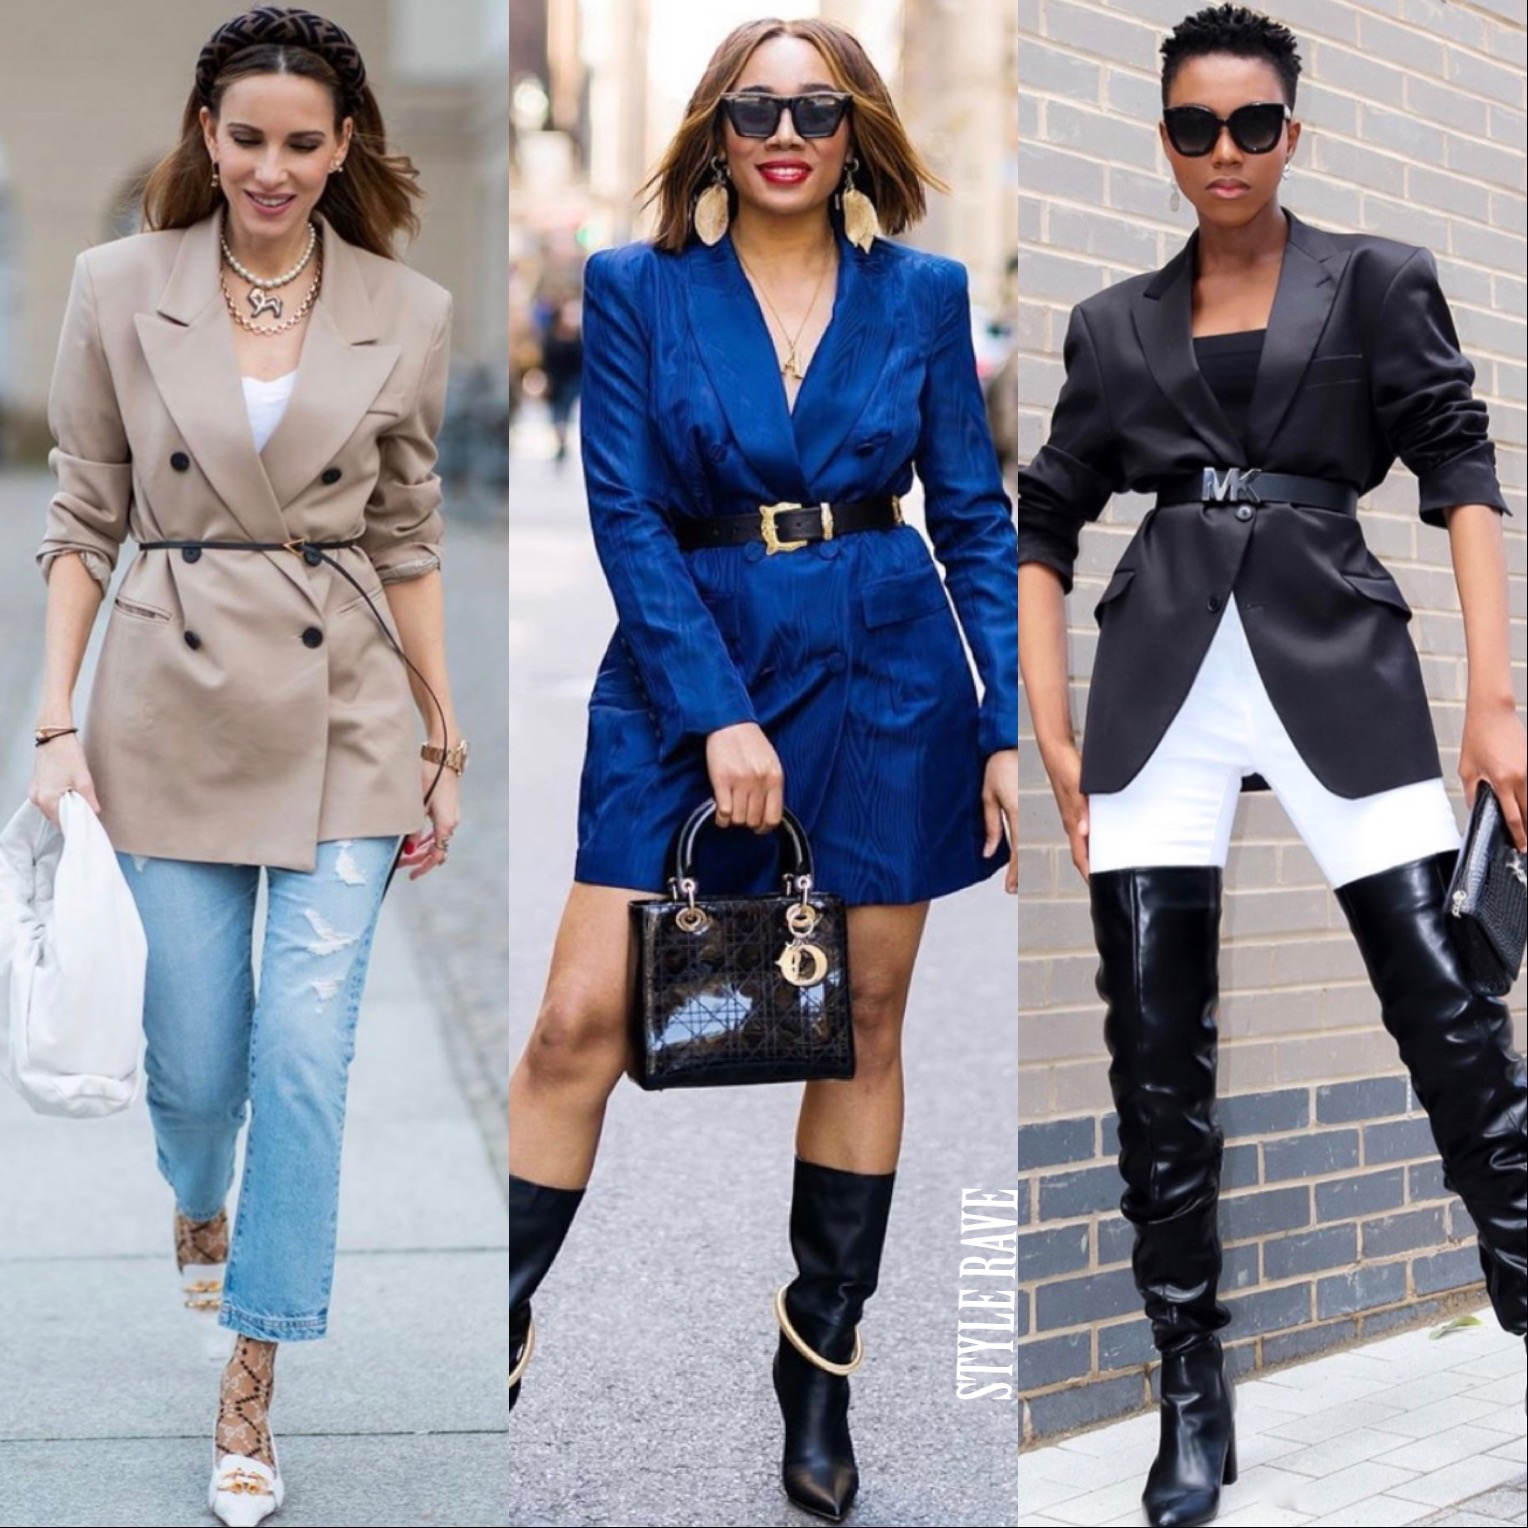 3 black women show how to wear belted blazers